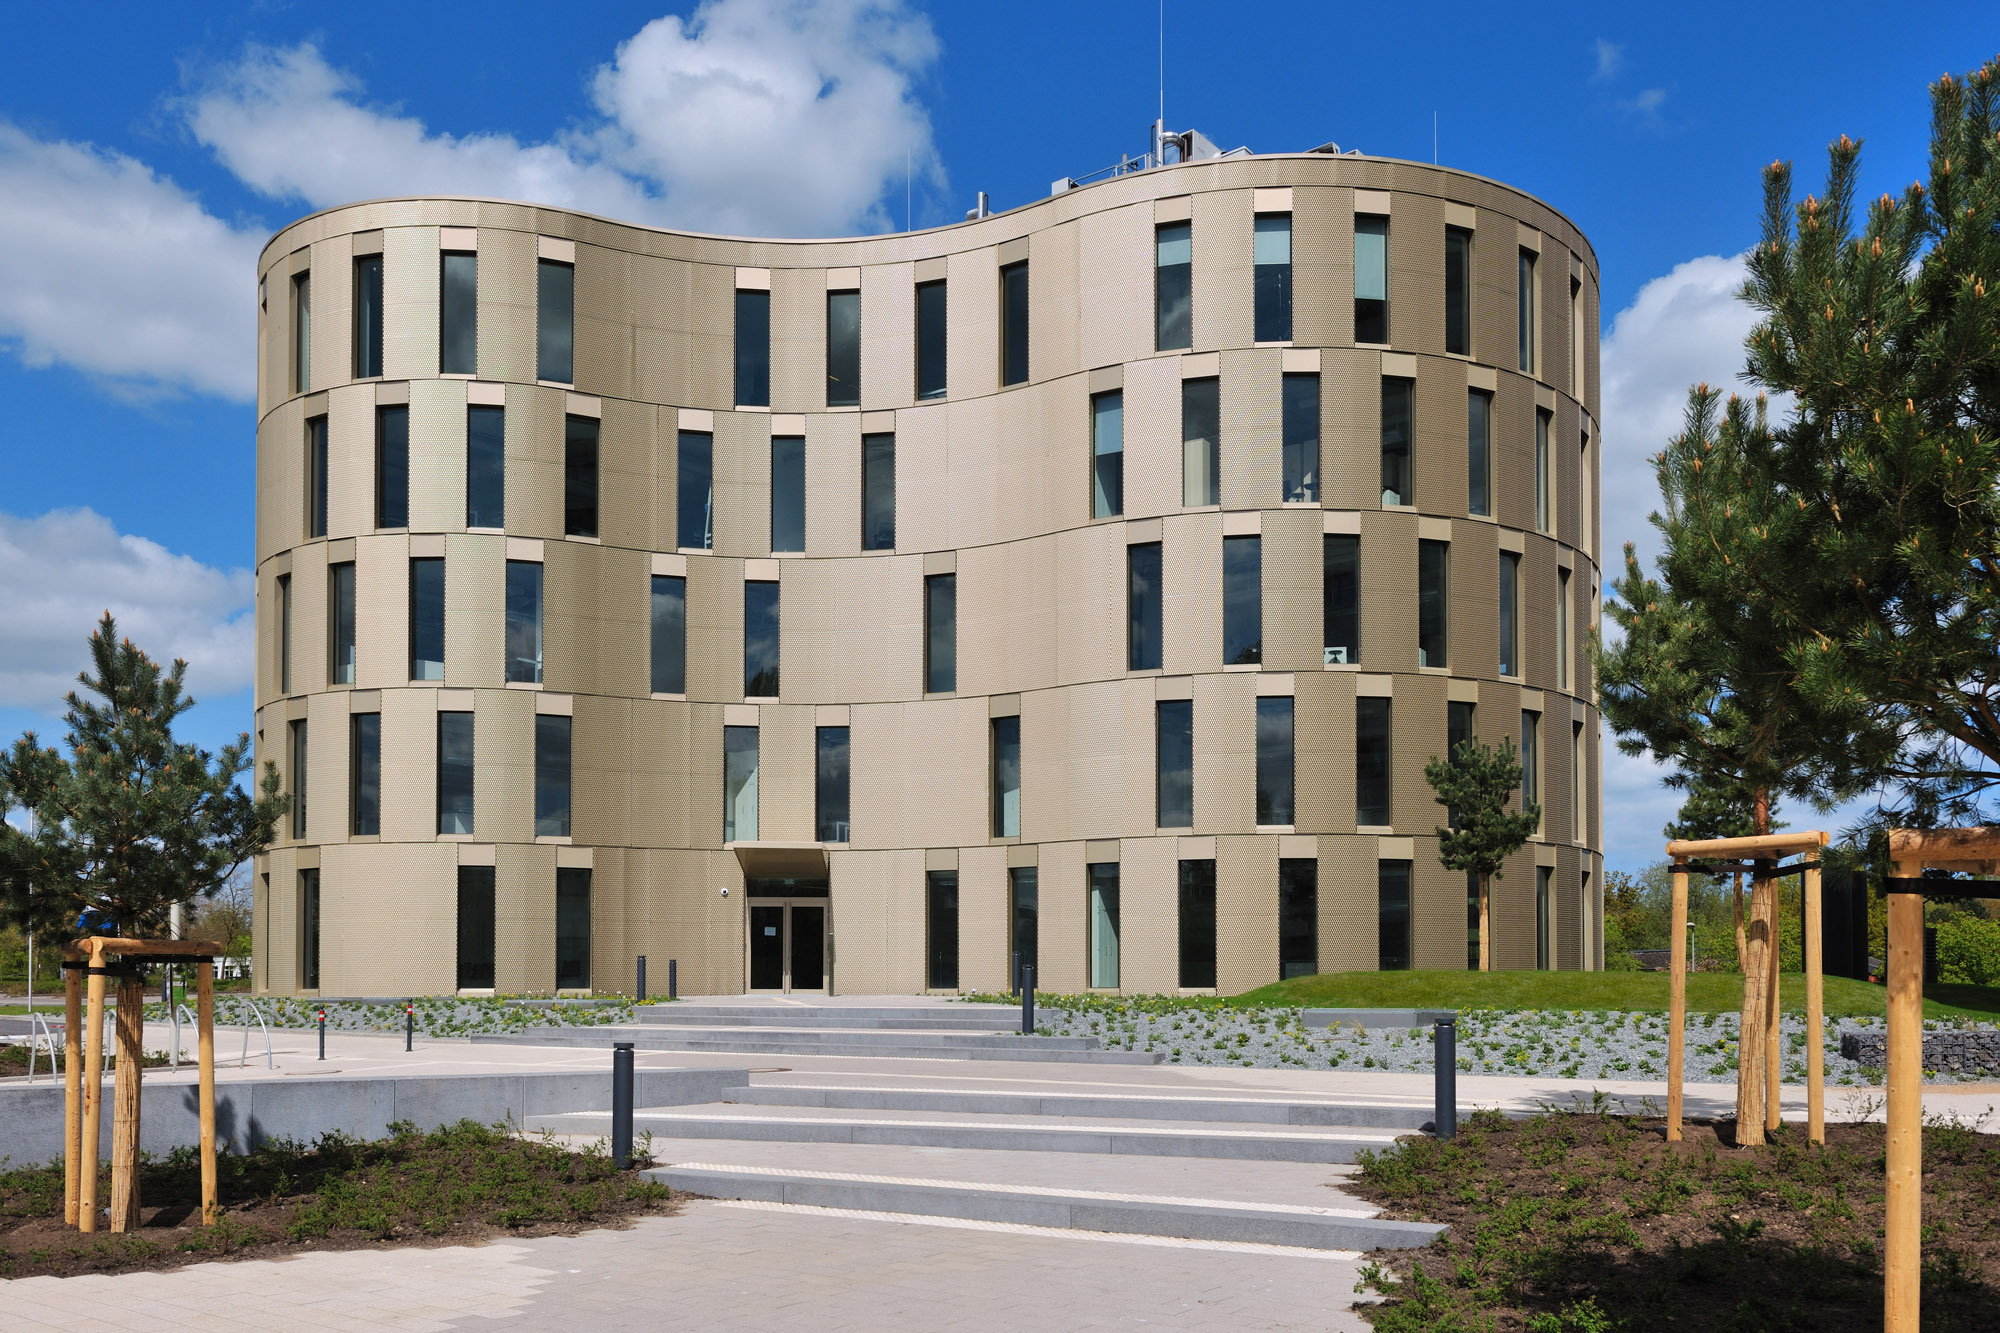 Siller landschaftsarchitekten kiel home - Architektur kiel ...